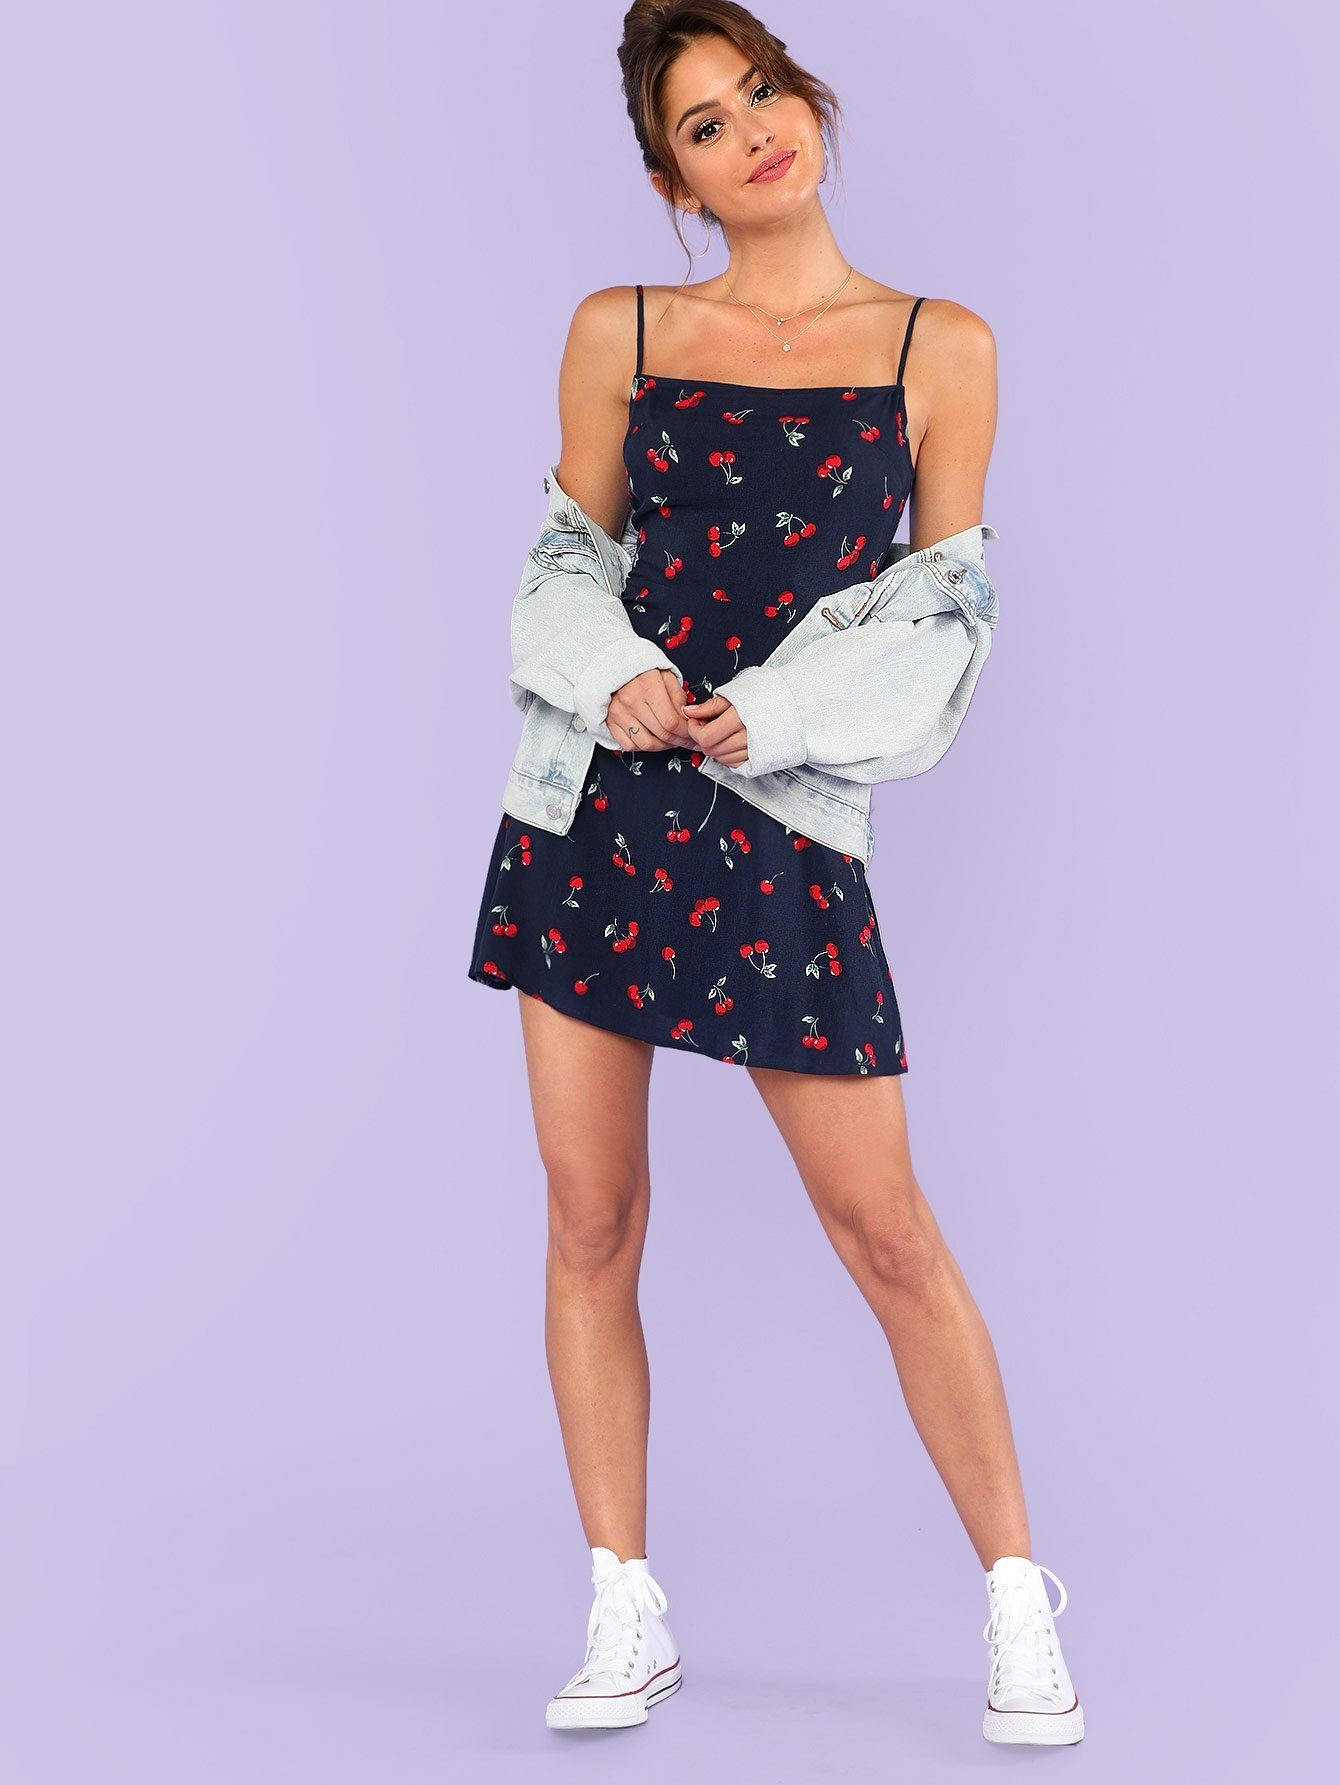 b19d3b335a Allover Cherry Print Cami Dress – Beryl Green   Berylgreen Boutique ...